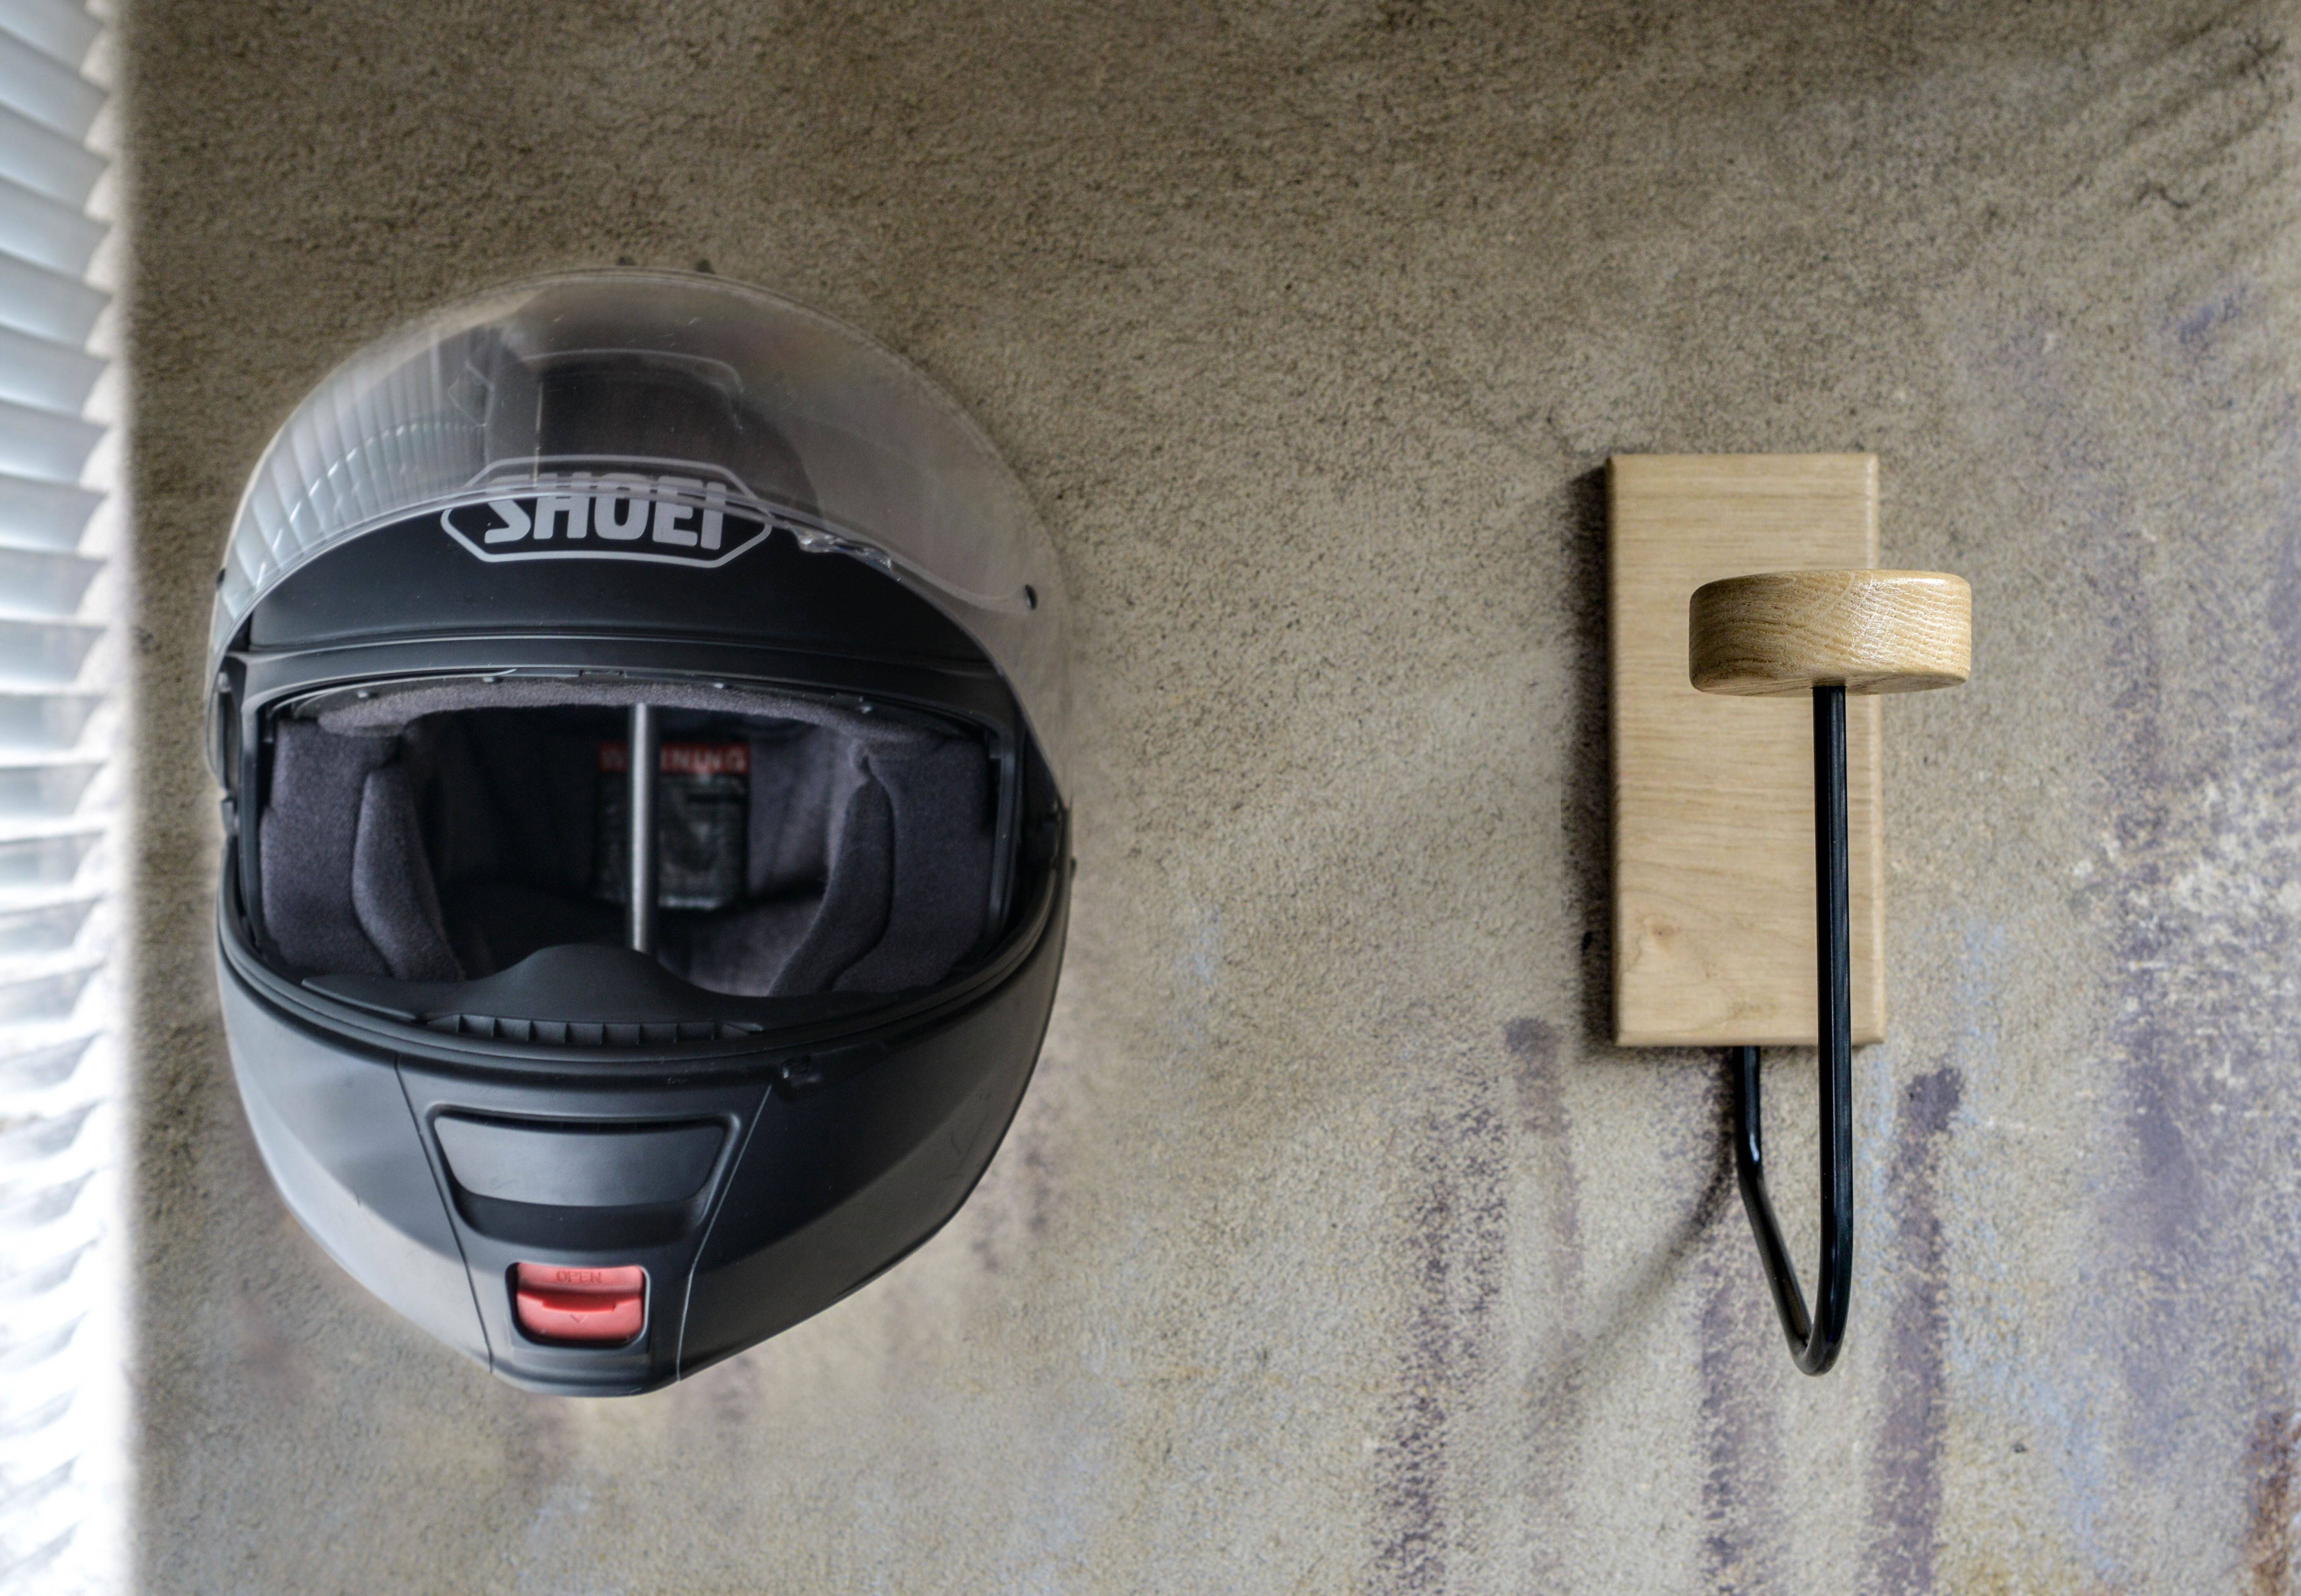 Porte Casque Helmet Rack France Waynscot Motorcycle Helmet Accessoires Decor Interieur Handmade Biker Idea Sho Em 2020 Capacete Arte Em Madeira